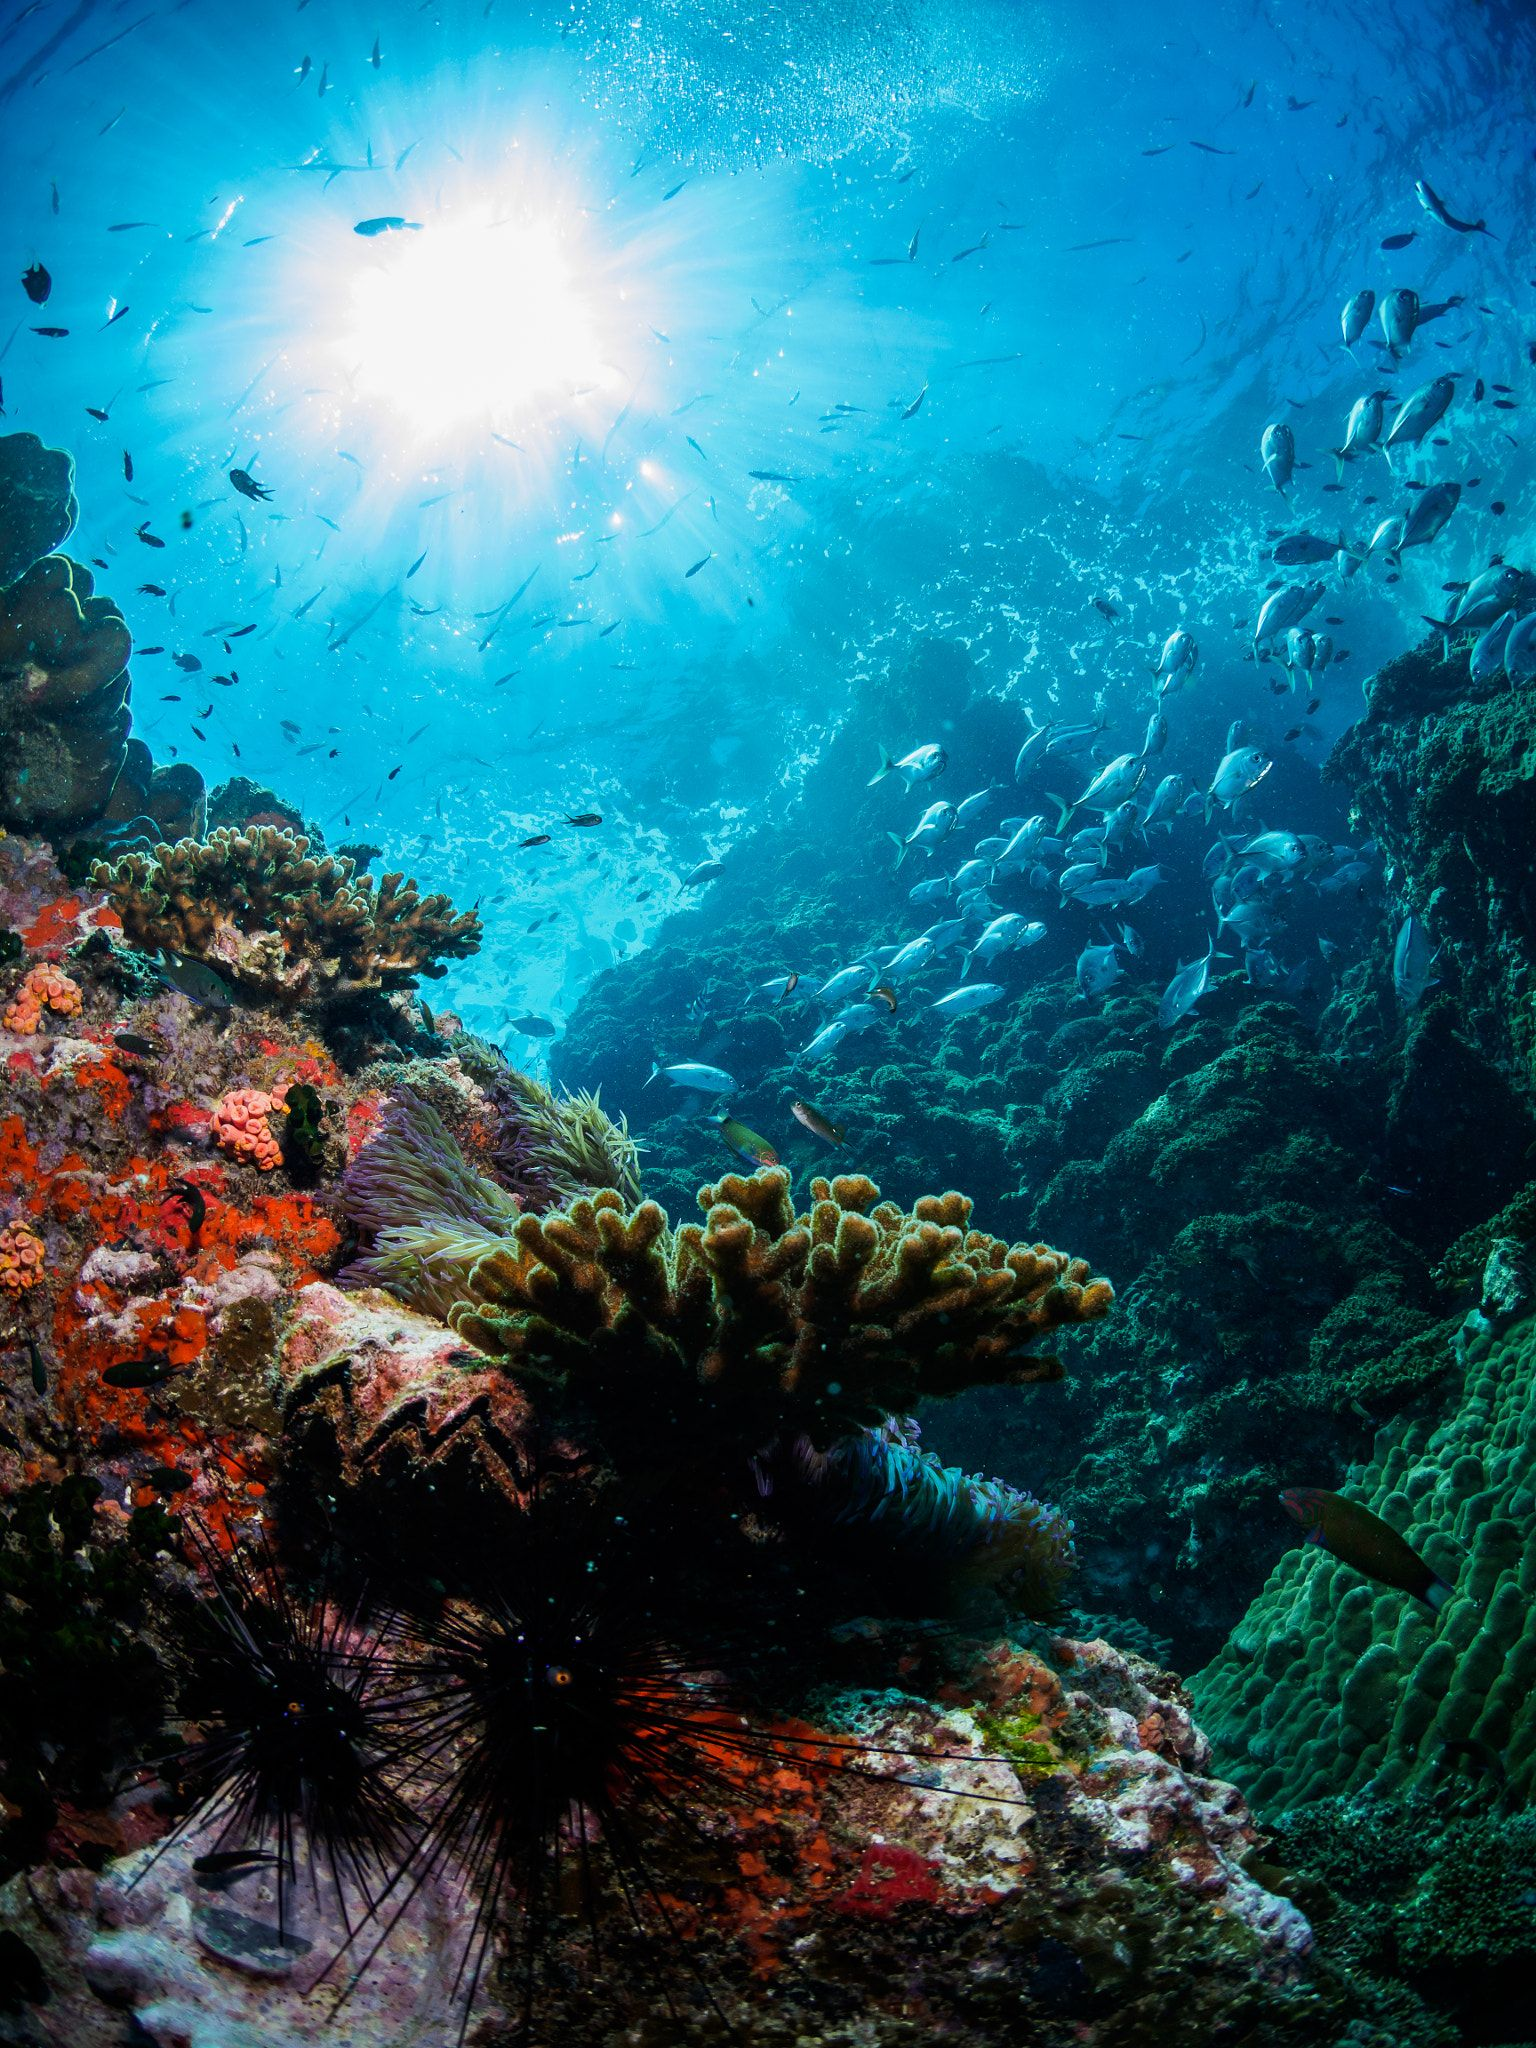 Stairway Sail Rock Thailand By Stefan Follows On 500px Underwater Photography Ocean Ocean Photography Ocean Underwater